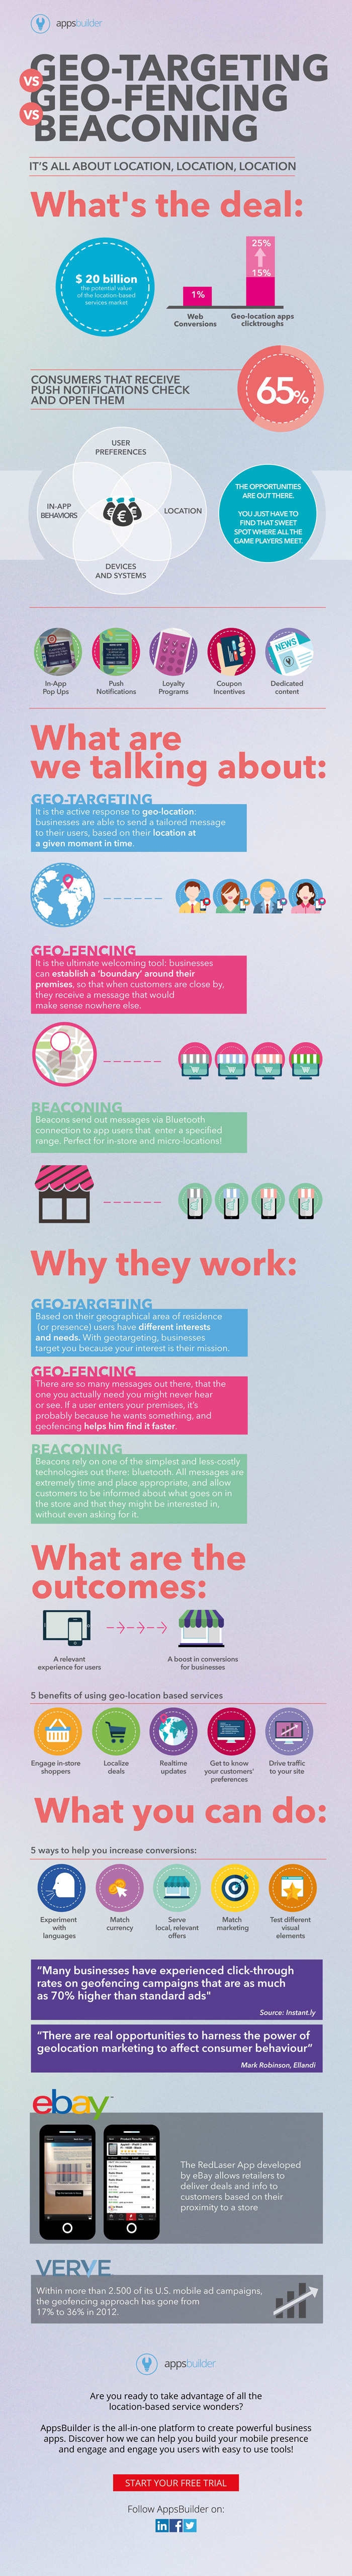 infographie-geolocalisation